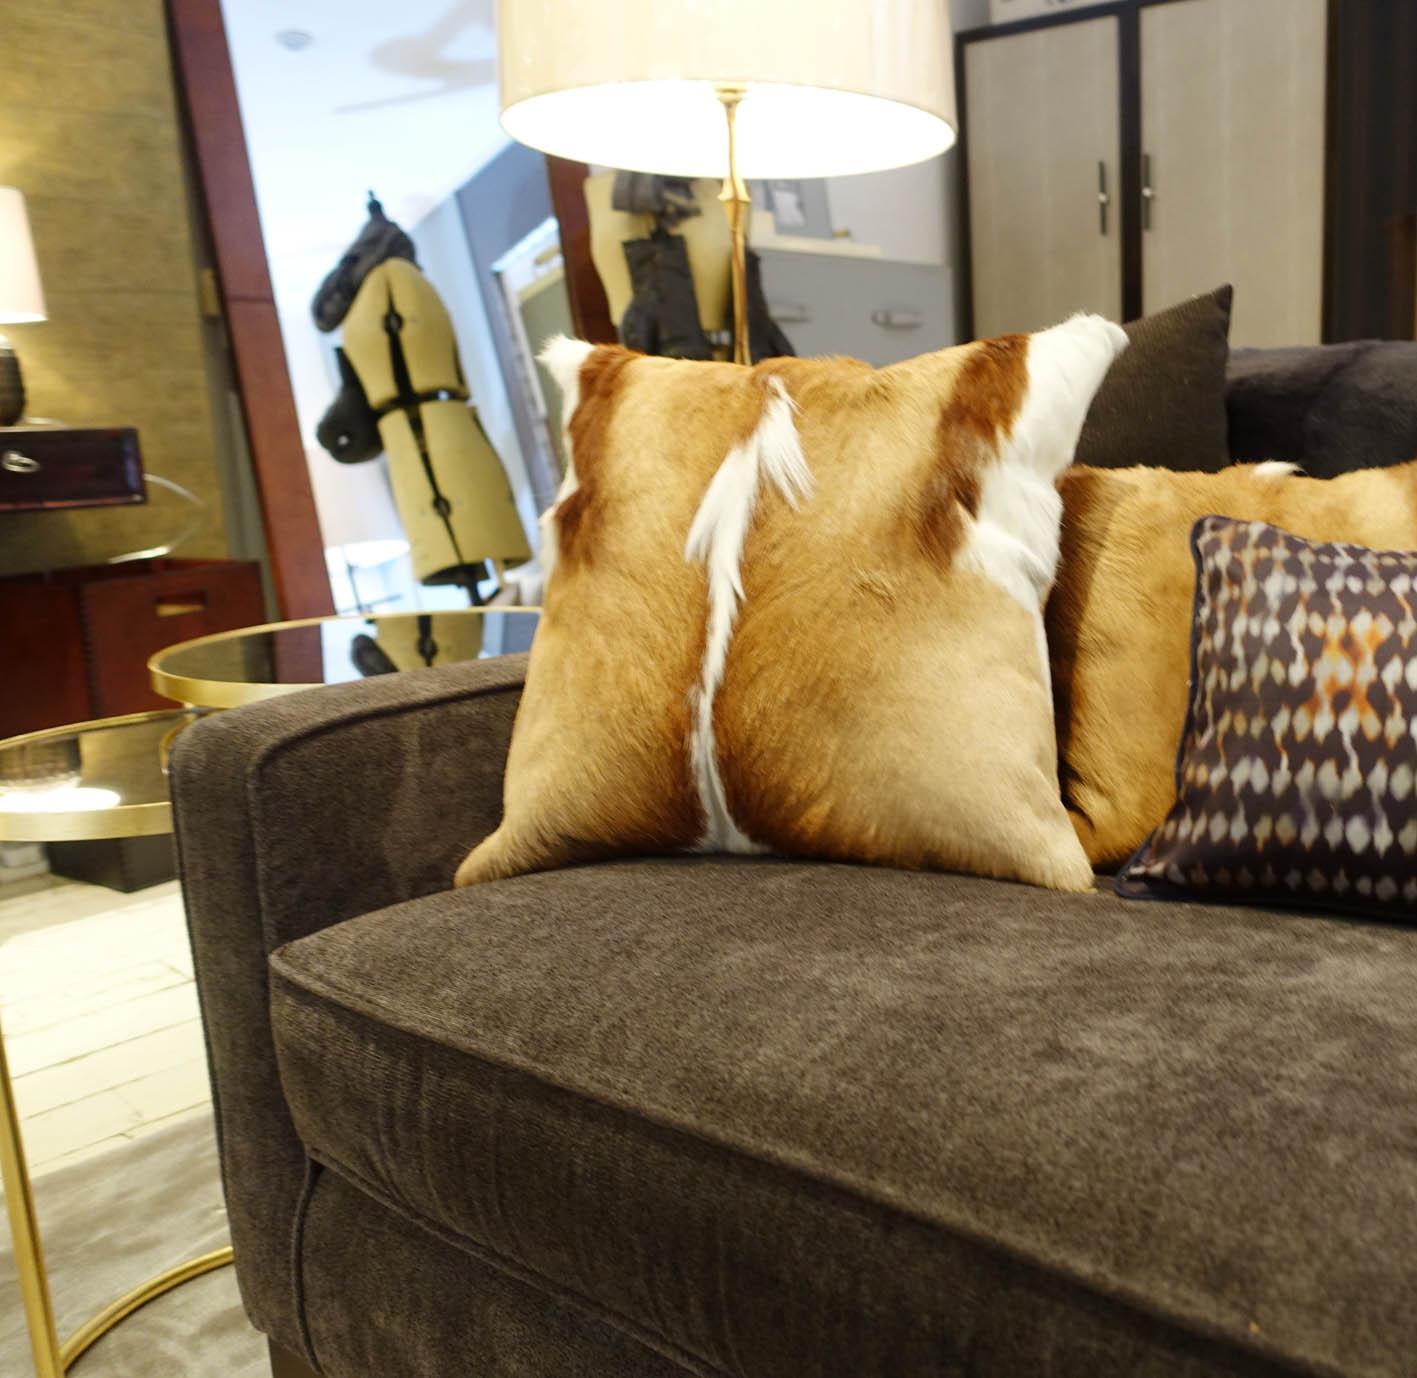 The  Springbok hide  and  Gemma  cushions